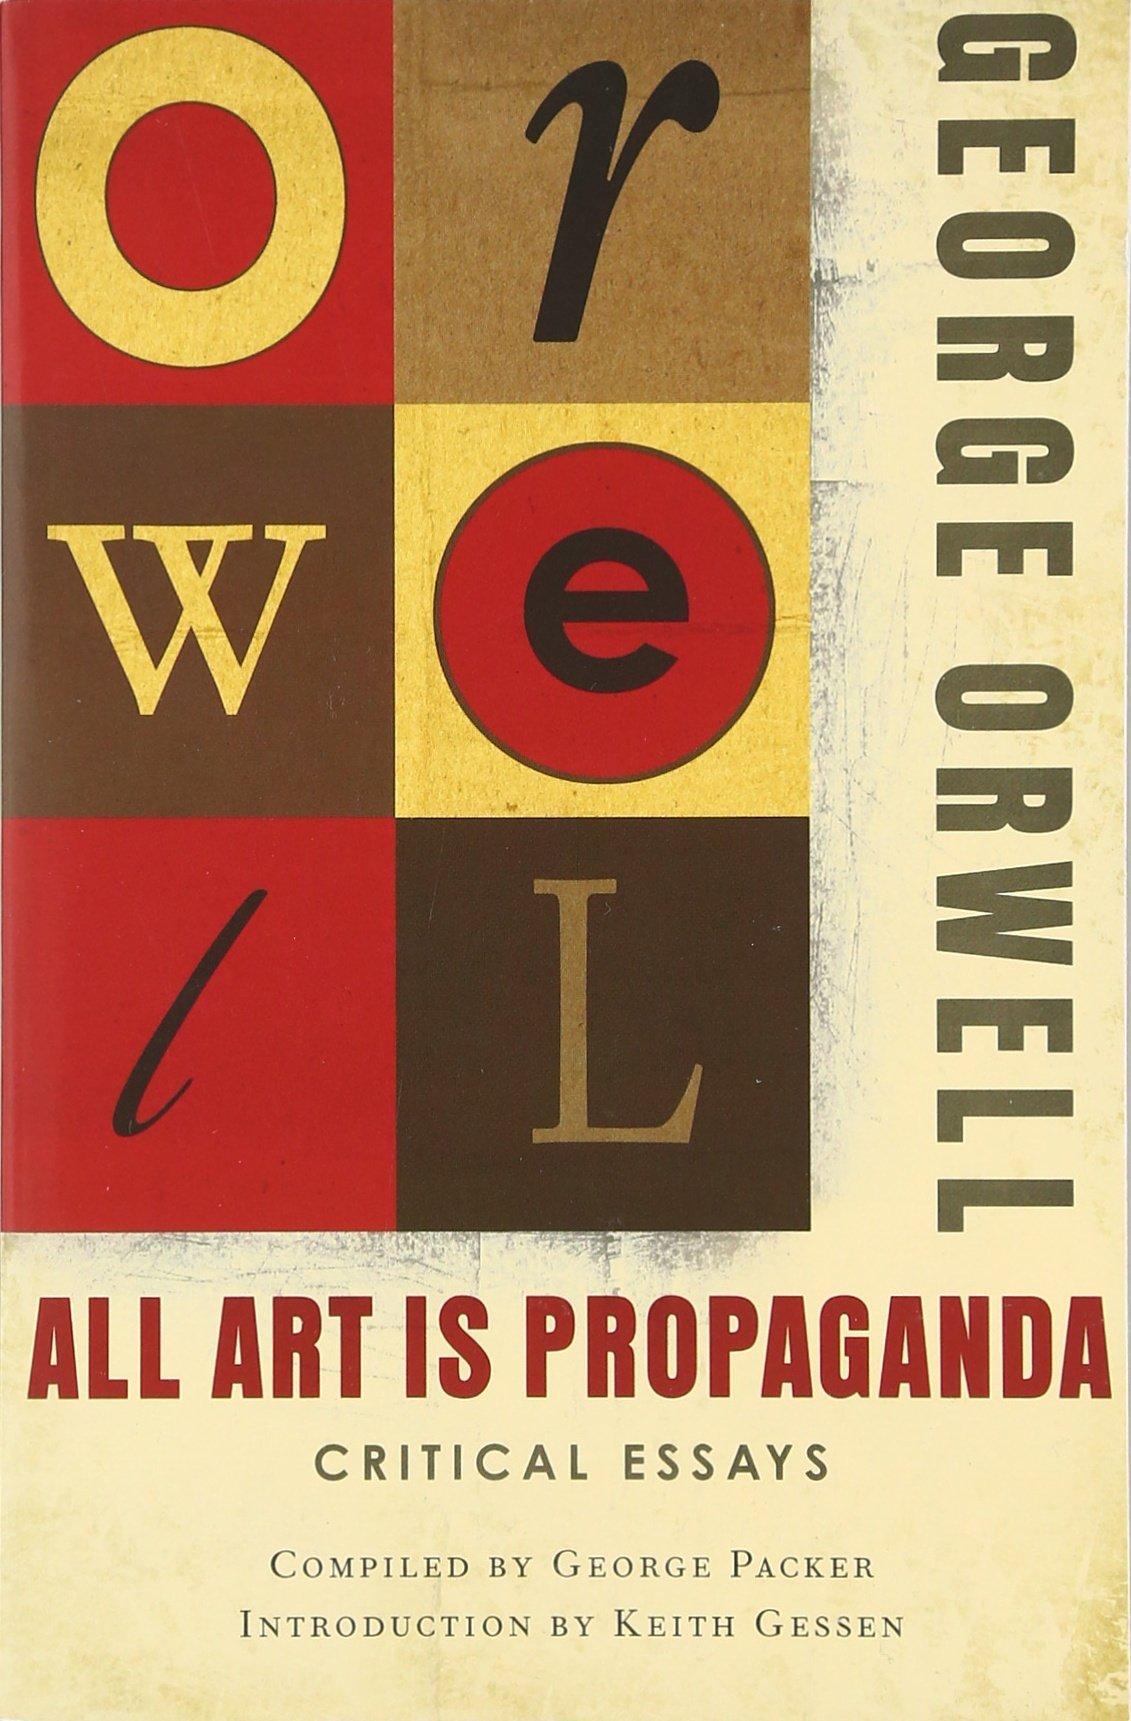 004 Essay Example 81lxm2g02fl George Orwell Frightening Essays Everyman's Library Summary Bookshop Memories Full